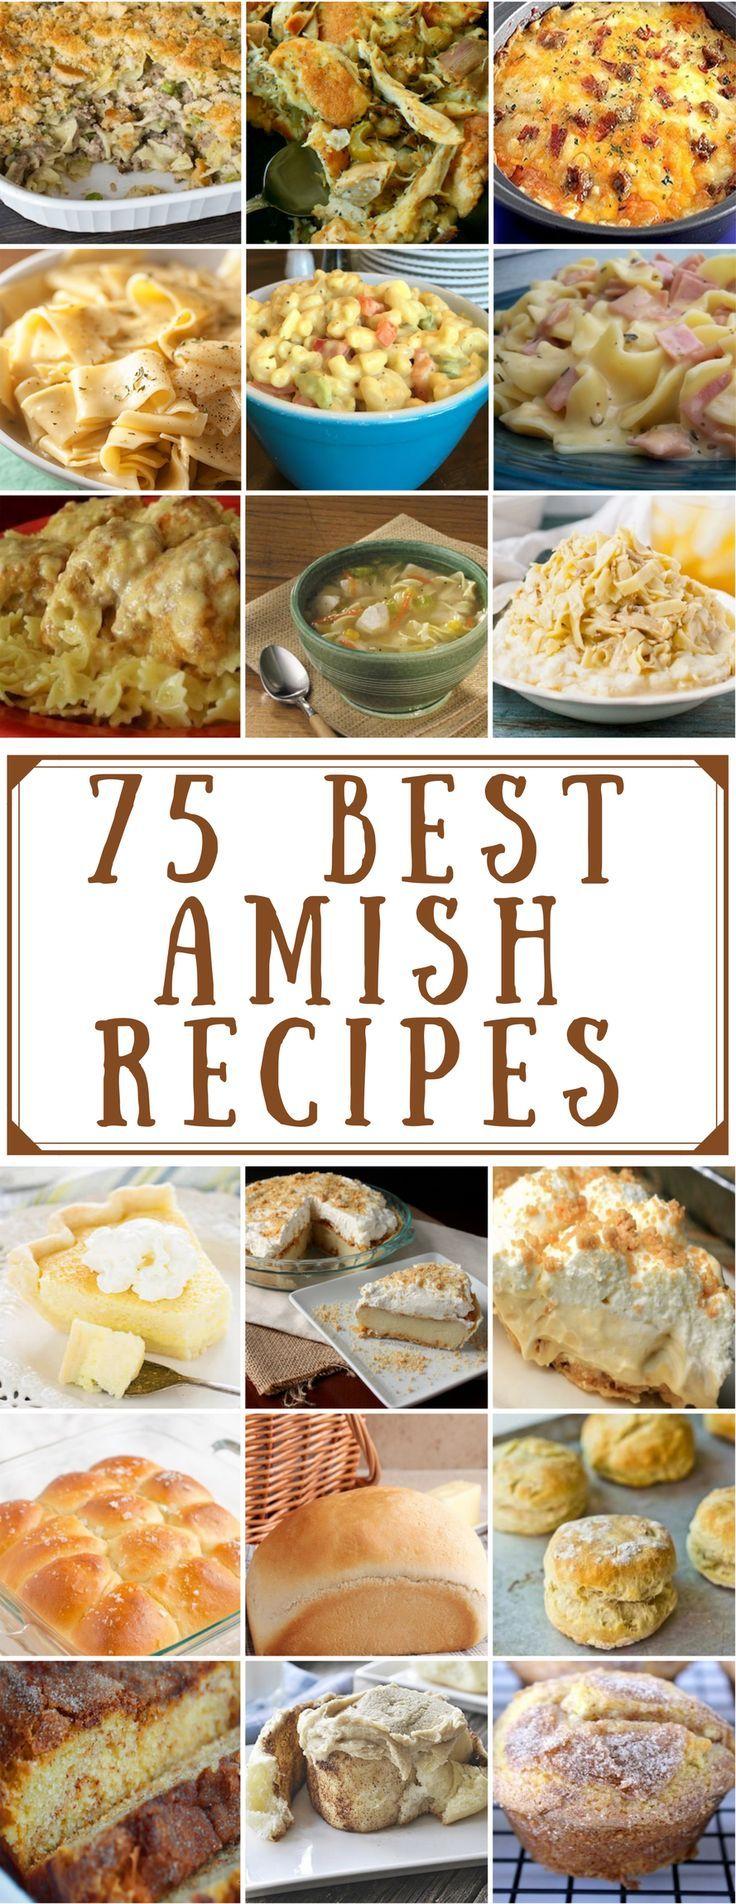 75 Best Amish Recipes | Otros | Pinterest | Amish